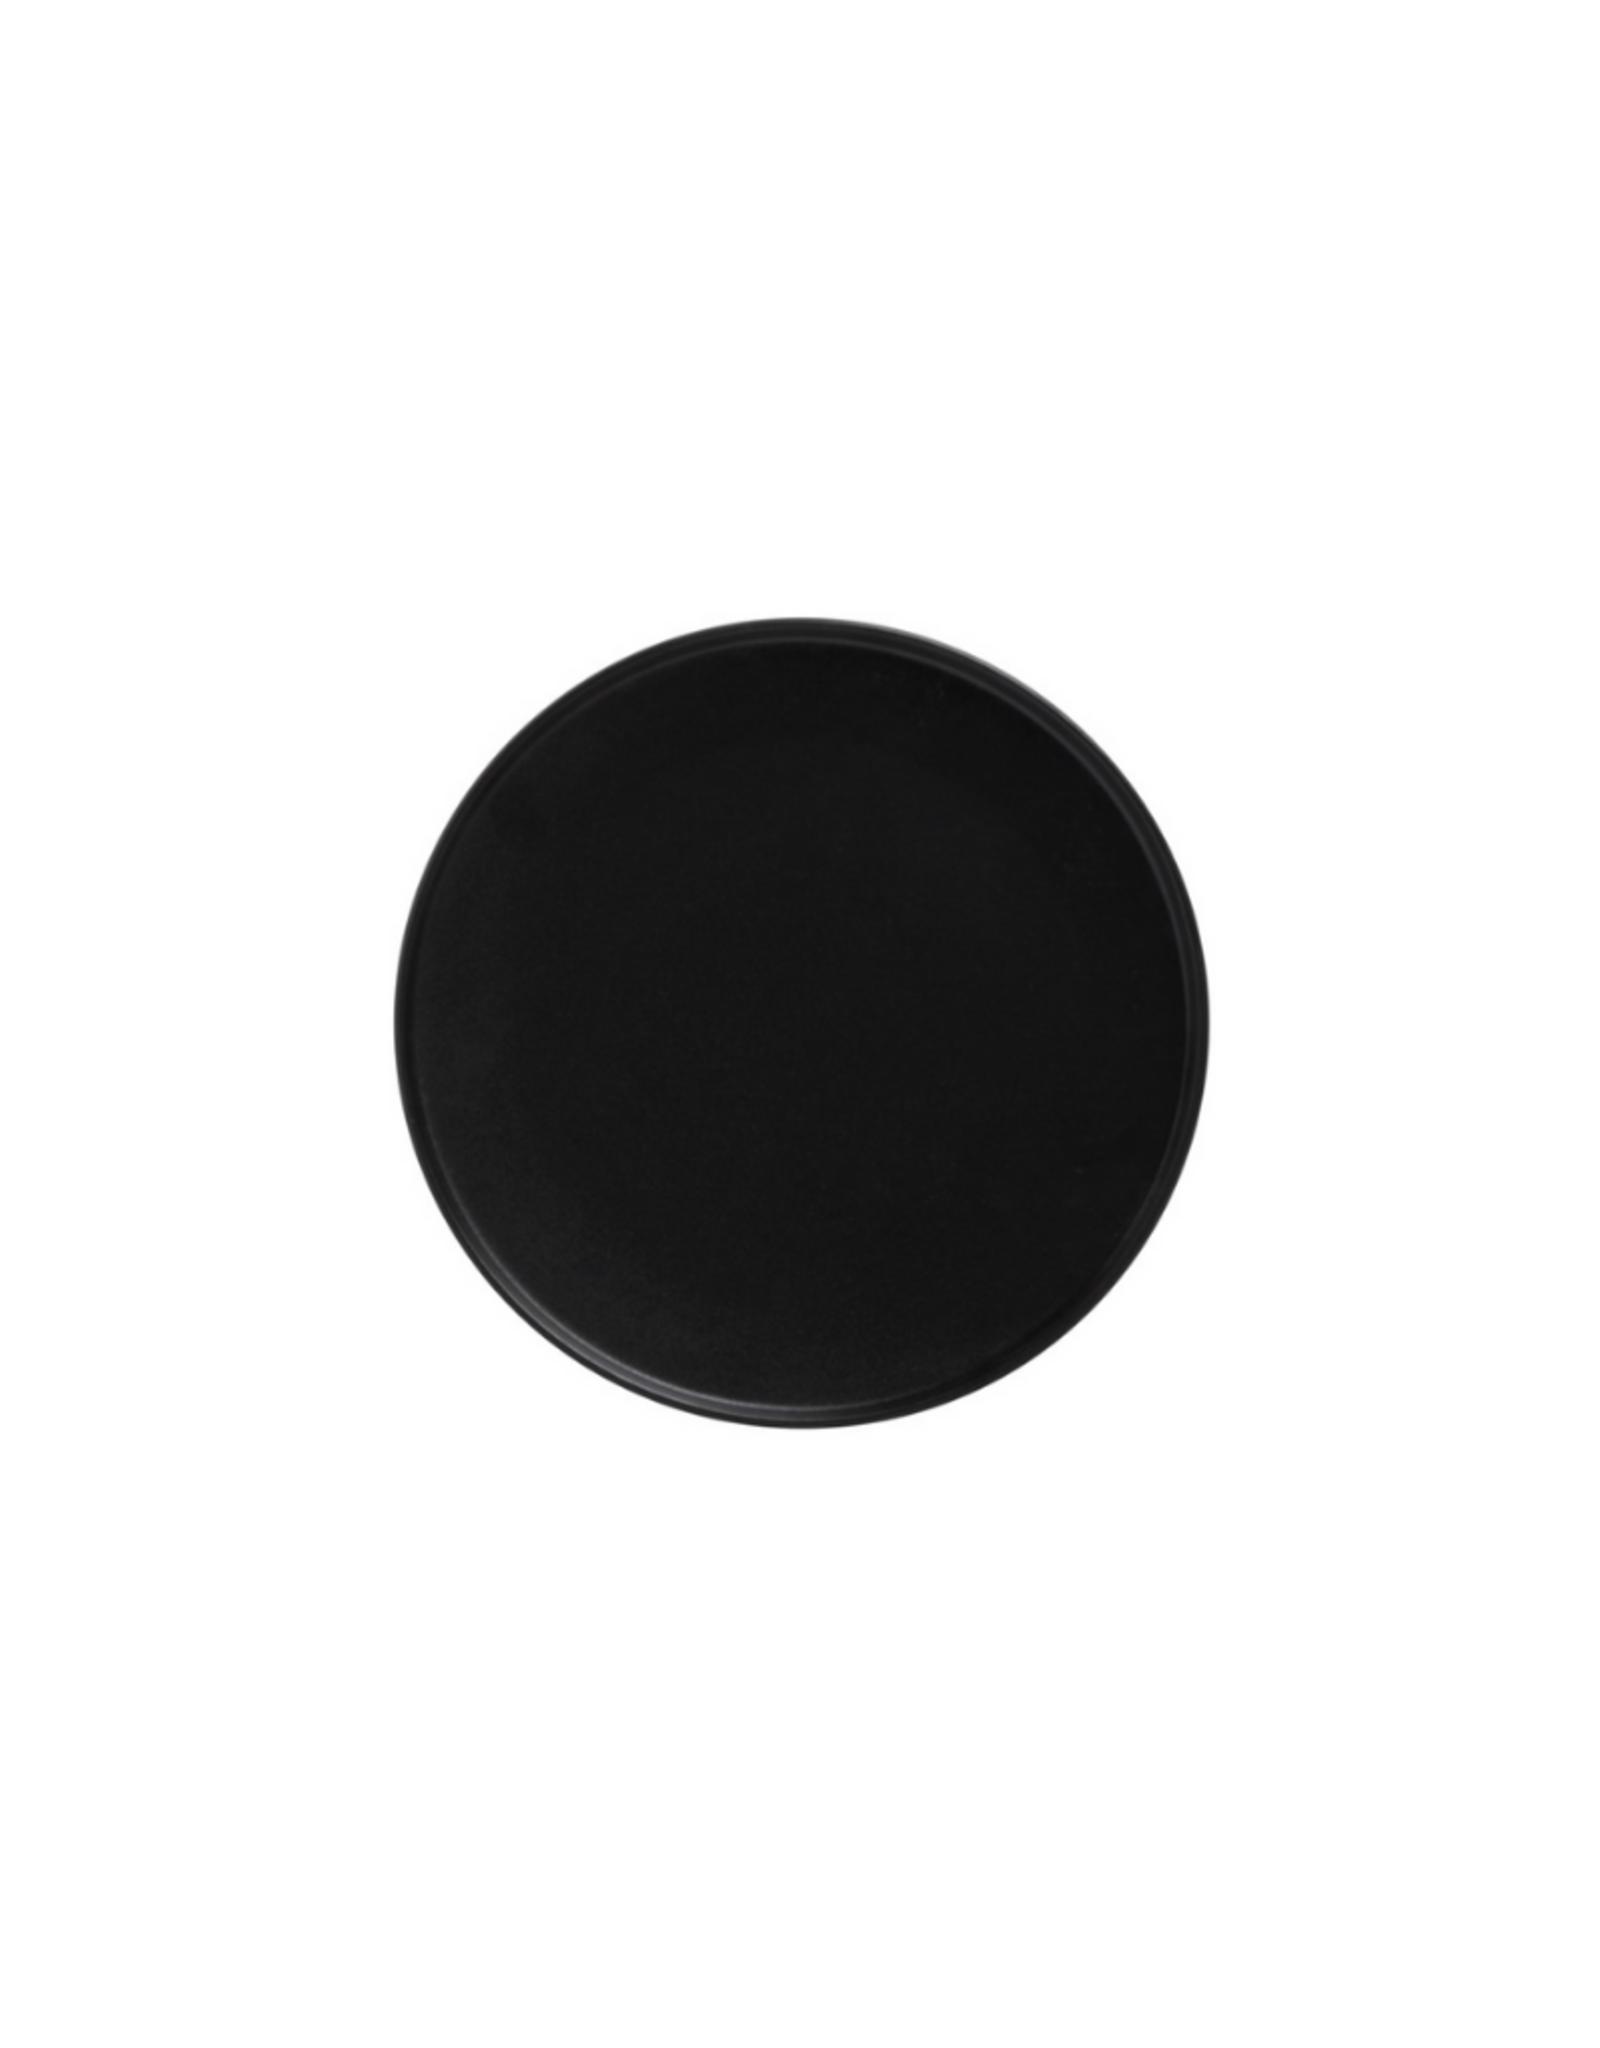 Maxwell Williams Assiette 'Caviar' bord élevé